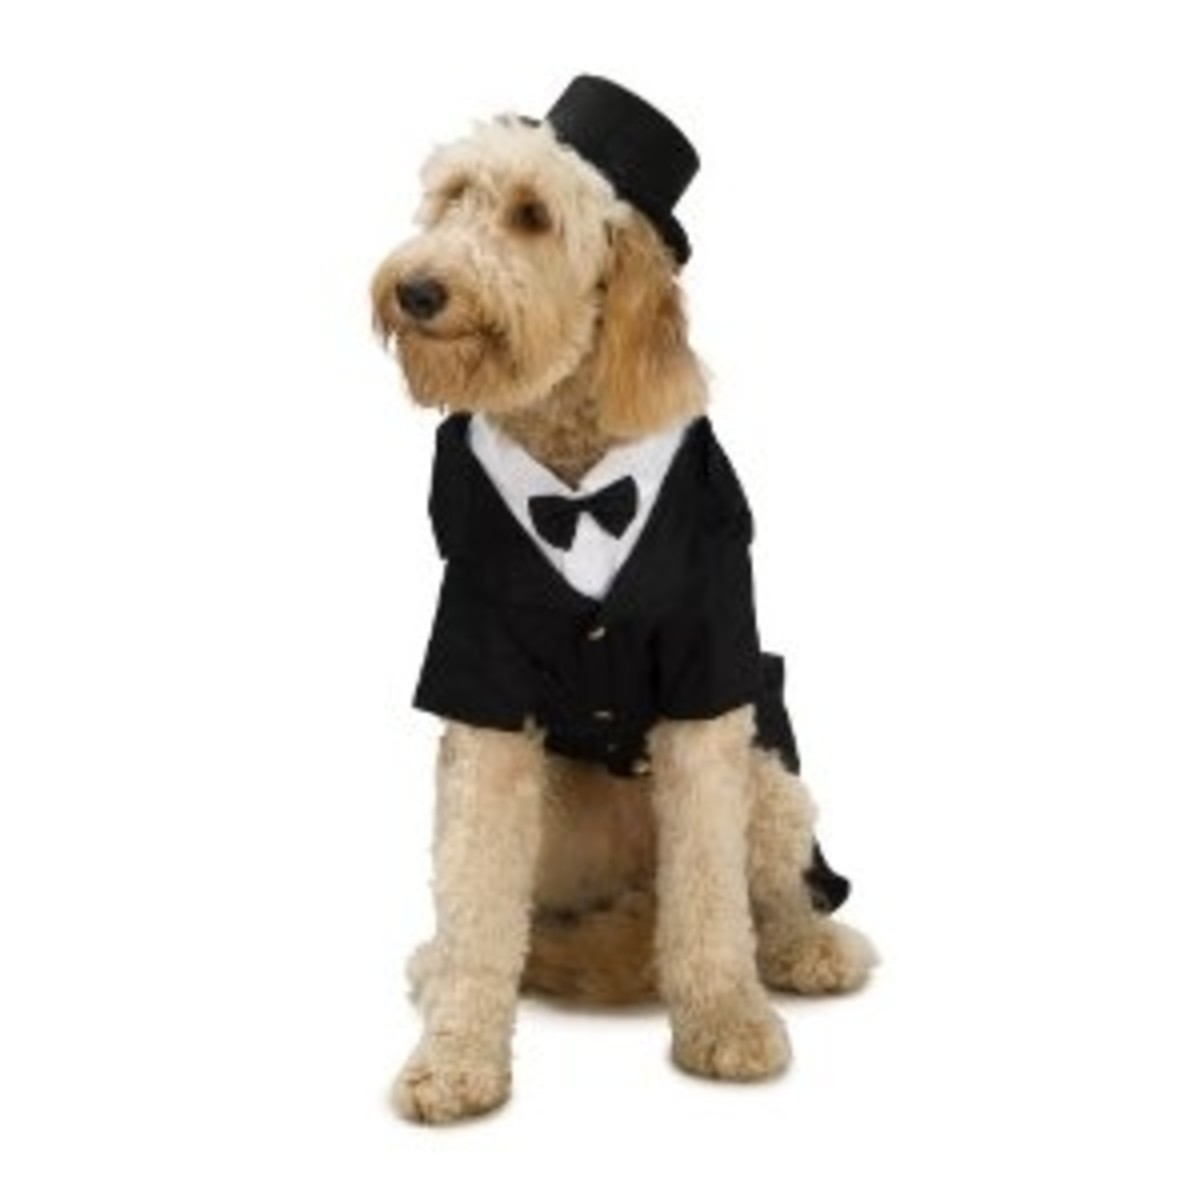 Dapper Dog Tuxedo X-Large Pet Costume